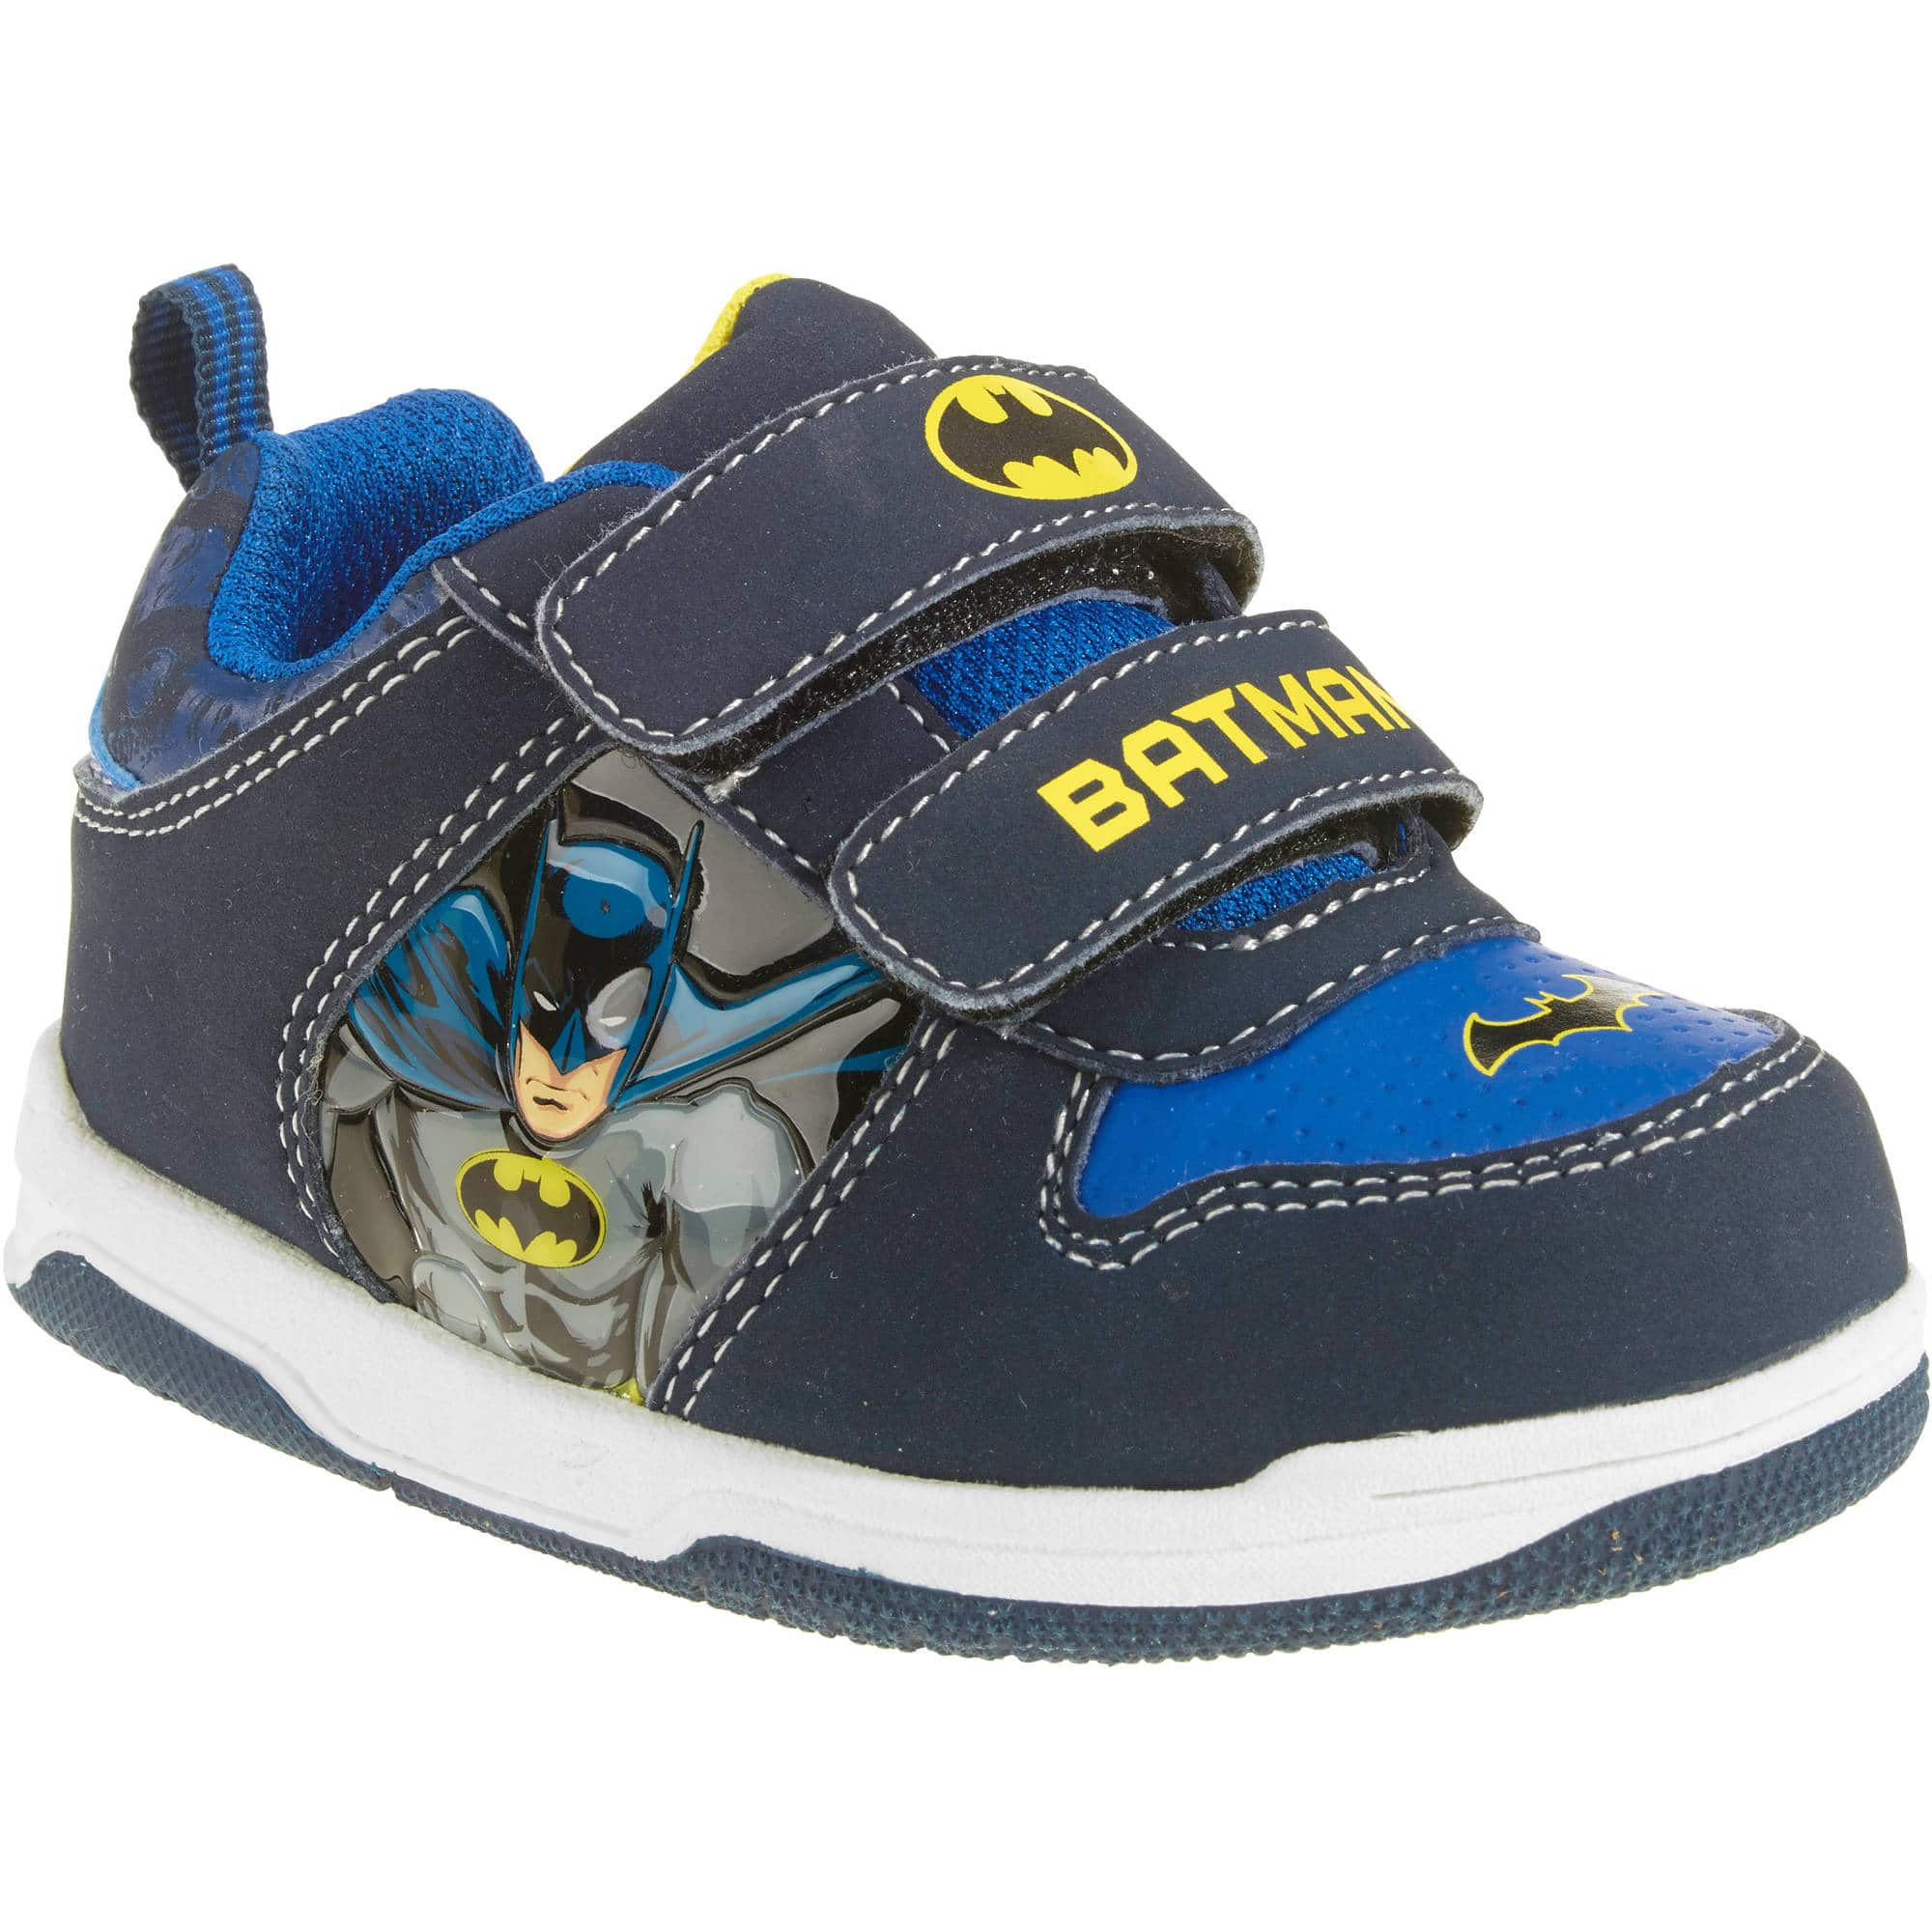 Walmart : Batman Toddler Boys' Skate Sneaker for $9.83 Free Pick Up